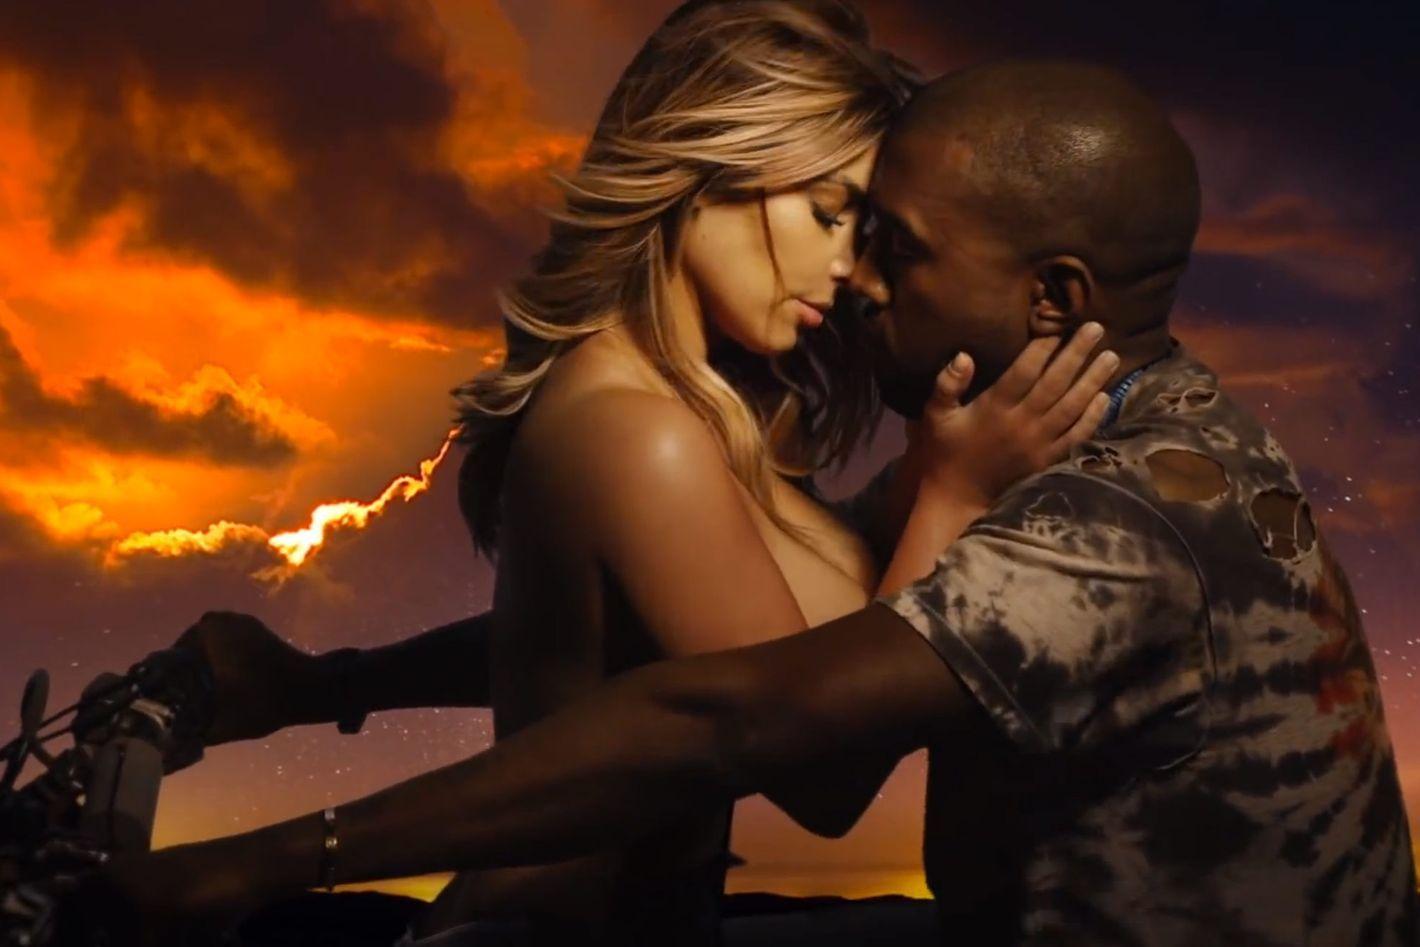 Resmi Bercerai, Intip Lagi Gaya Mesra Kim Kardashian dan Kanye West